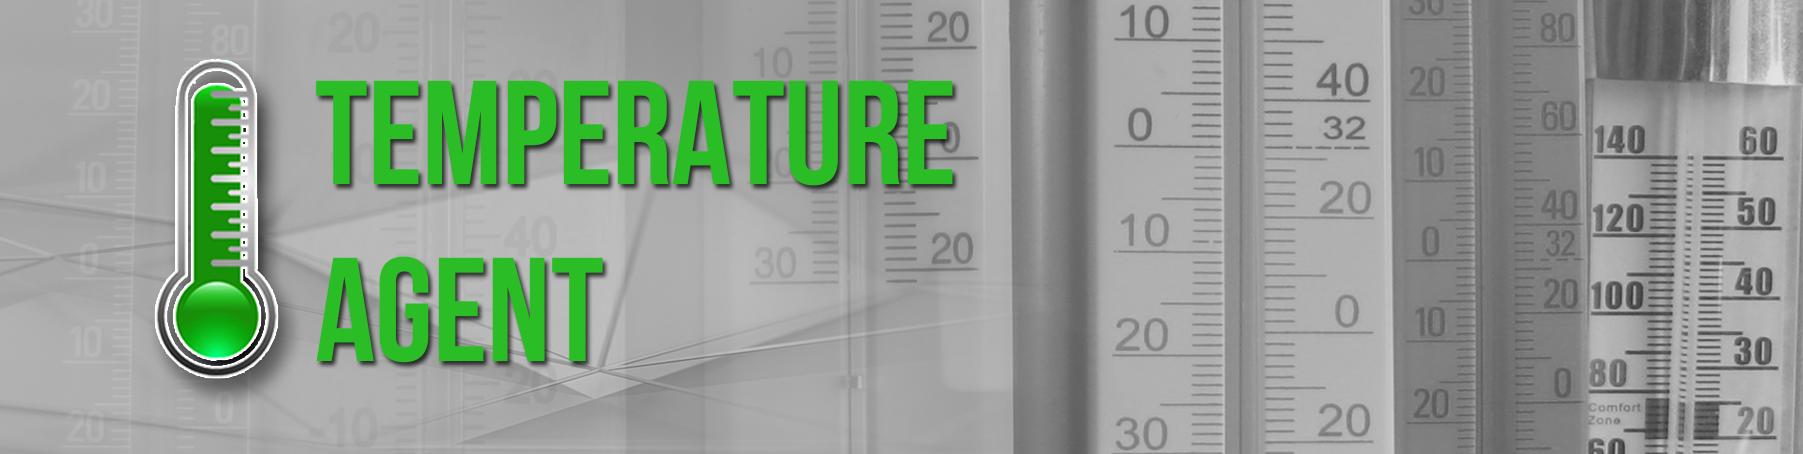 Temperature%20Agent.png?1567705969172